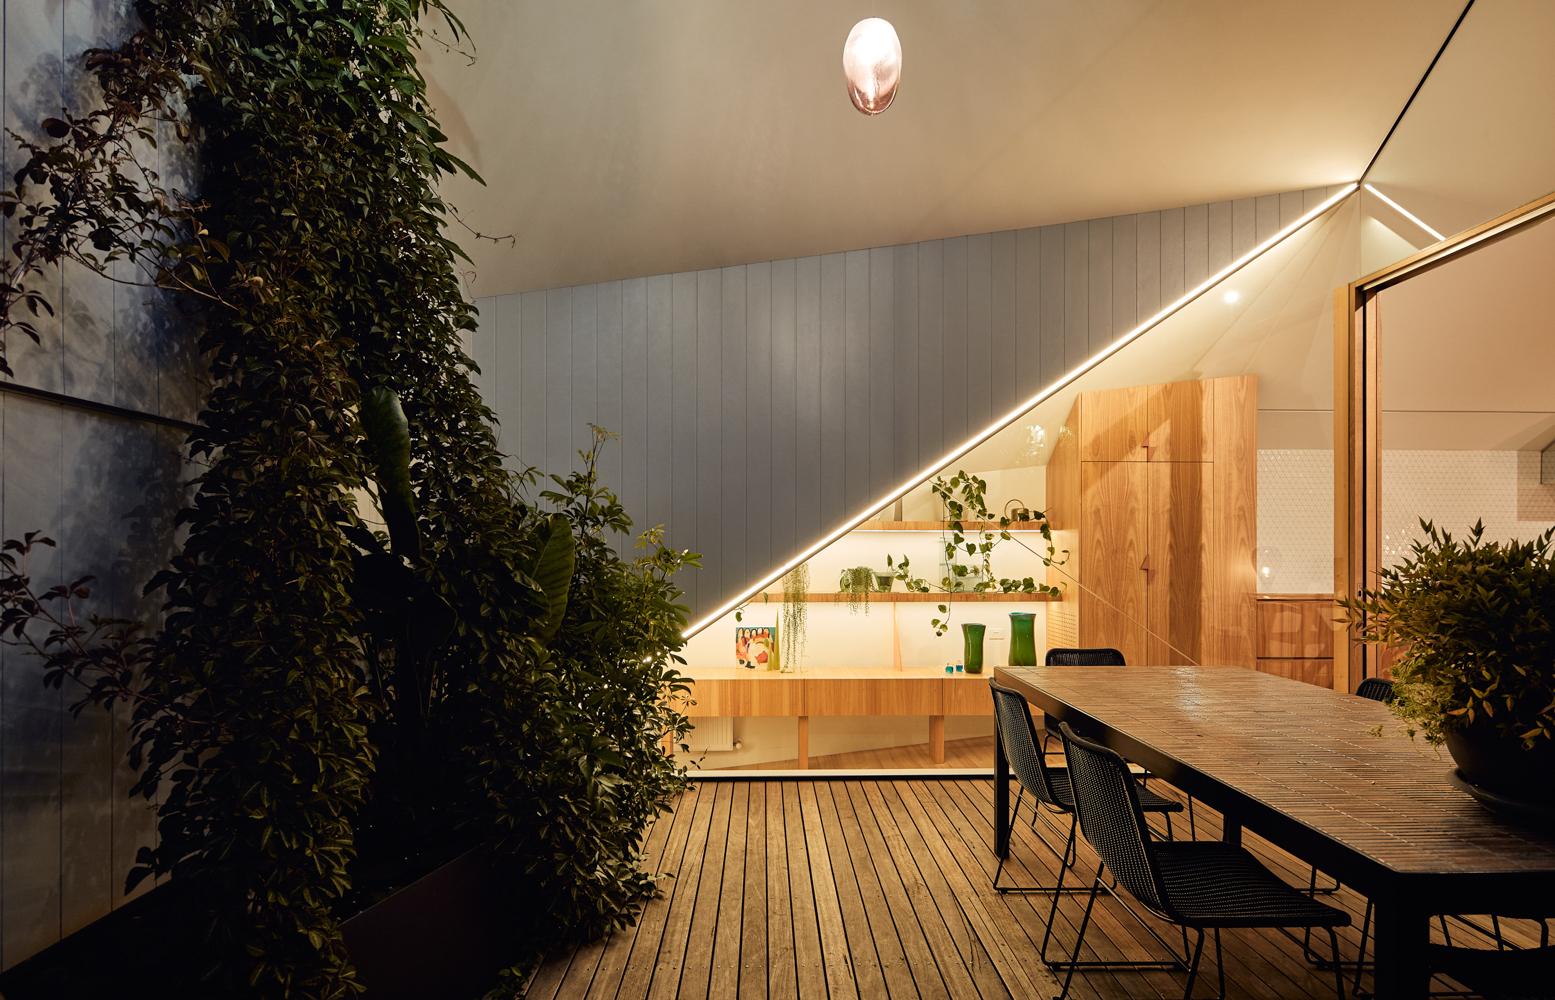 Outdoor area design